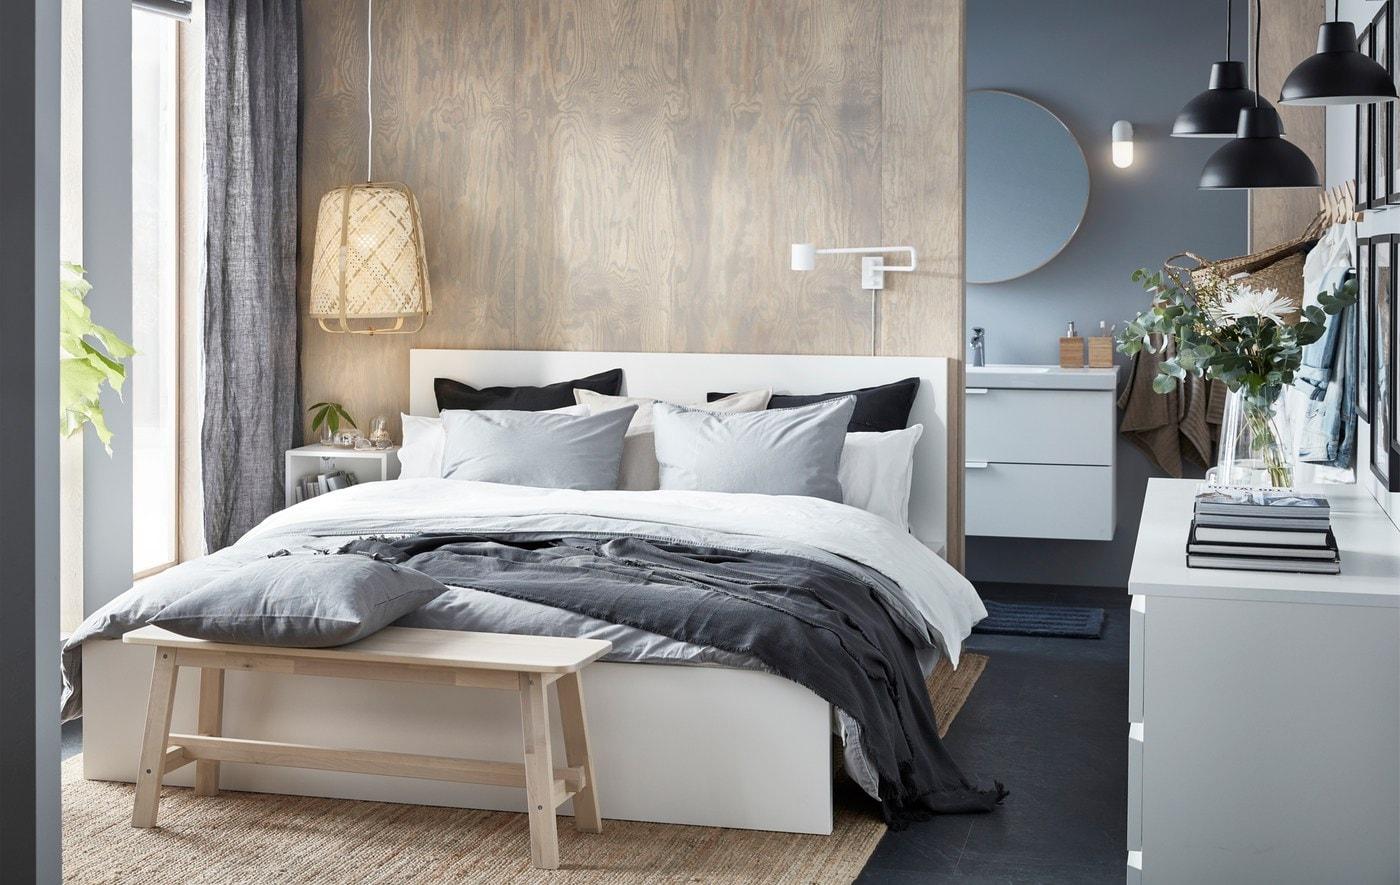 Minimalist luxury in a small and stylish bedroom - IKEA CA